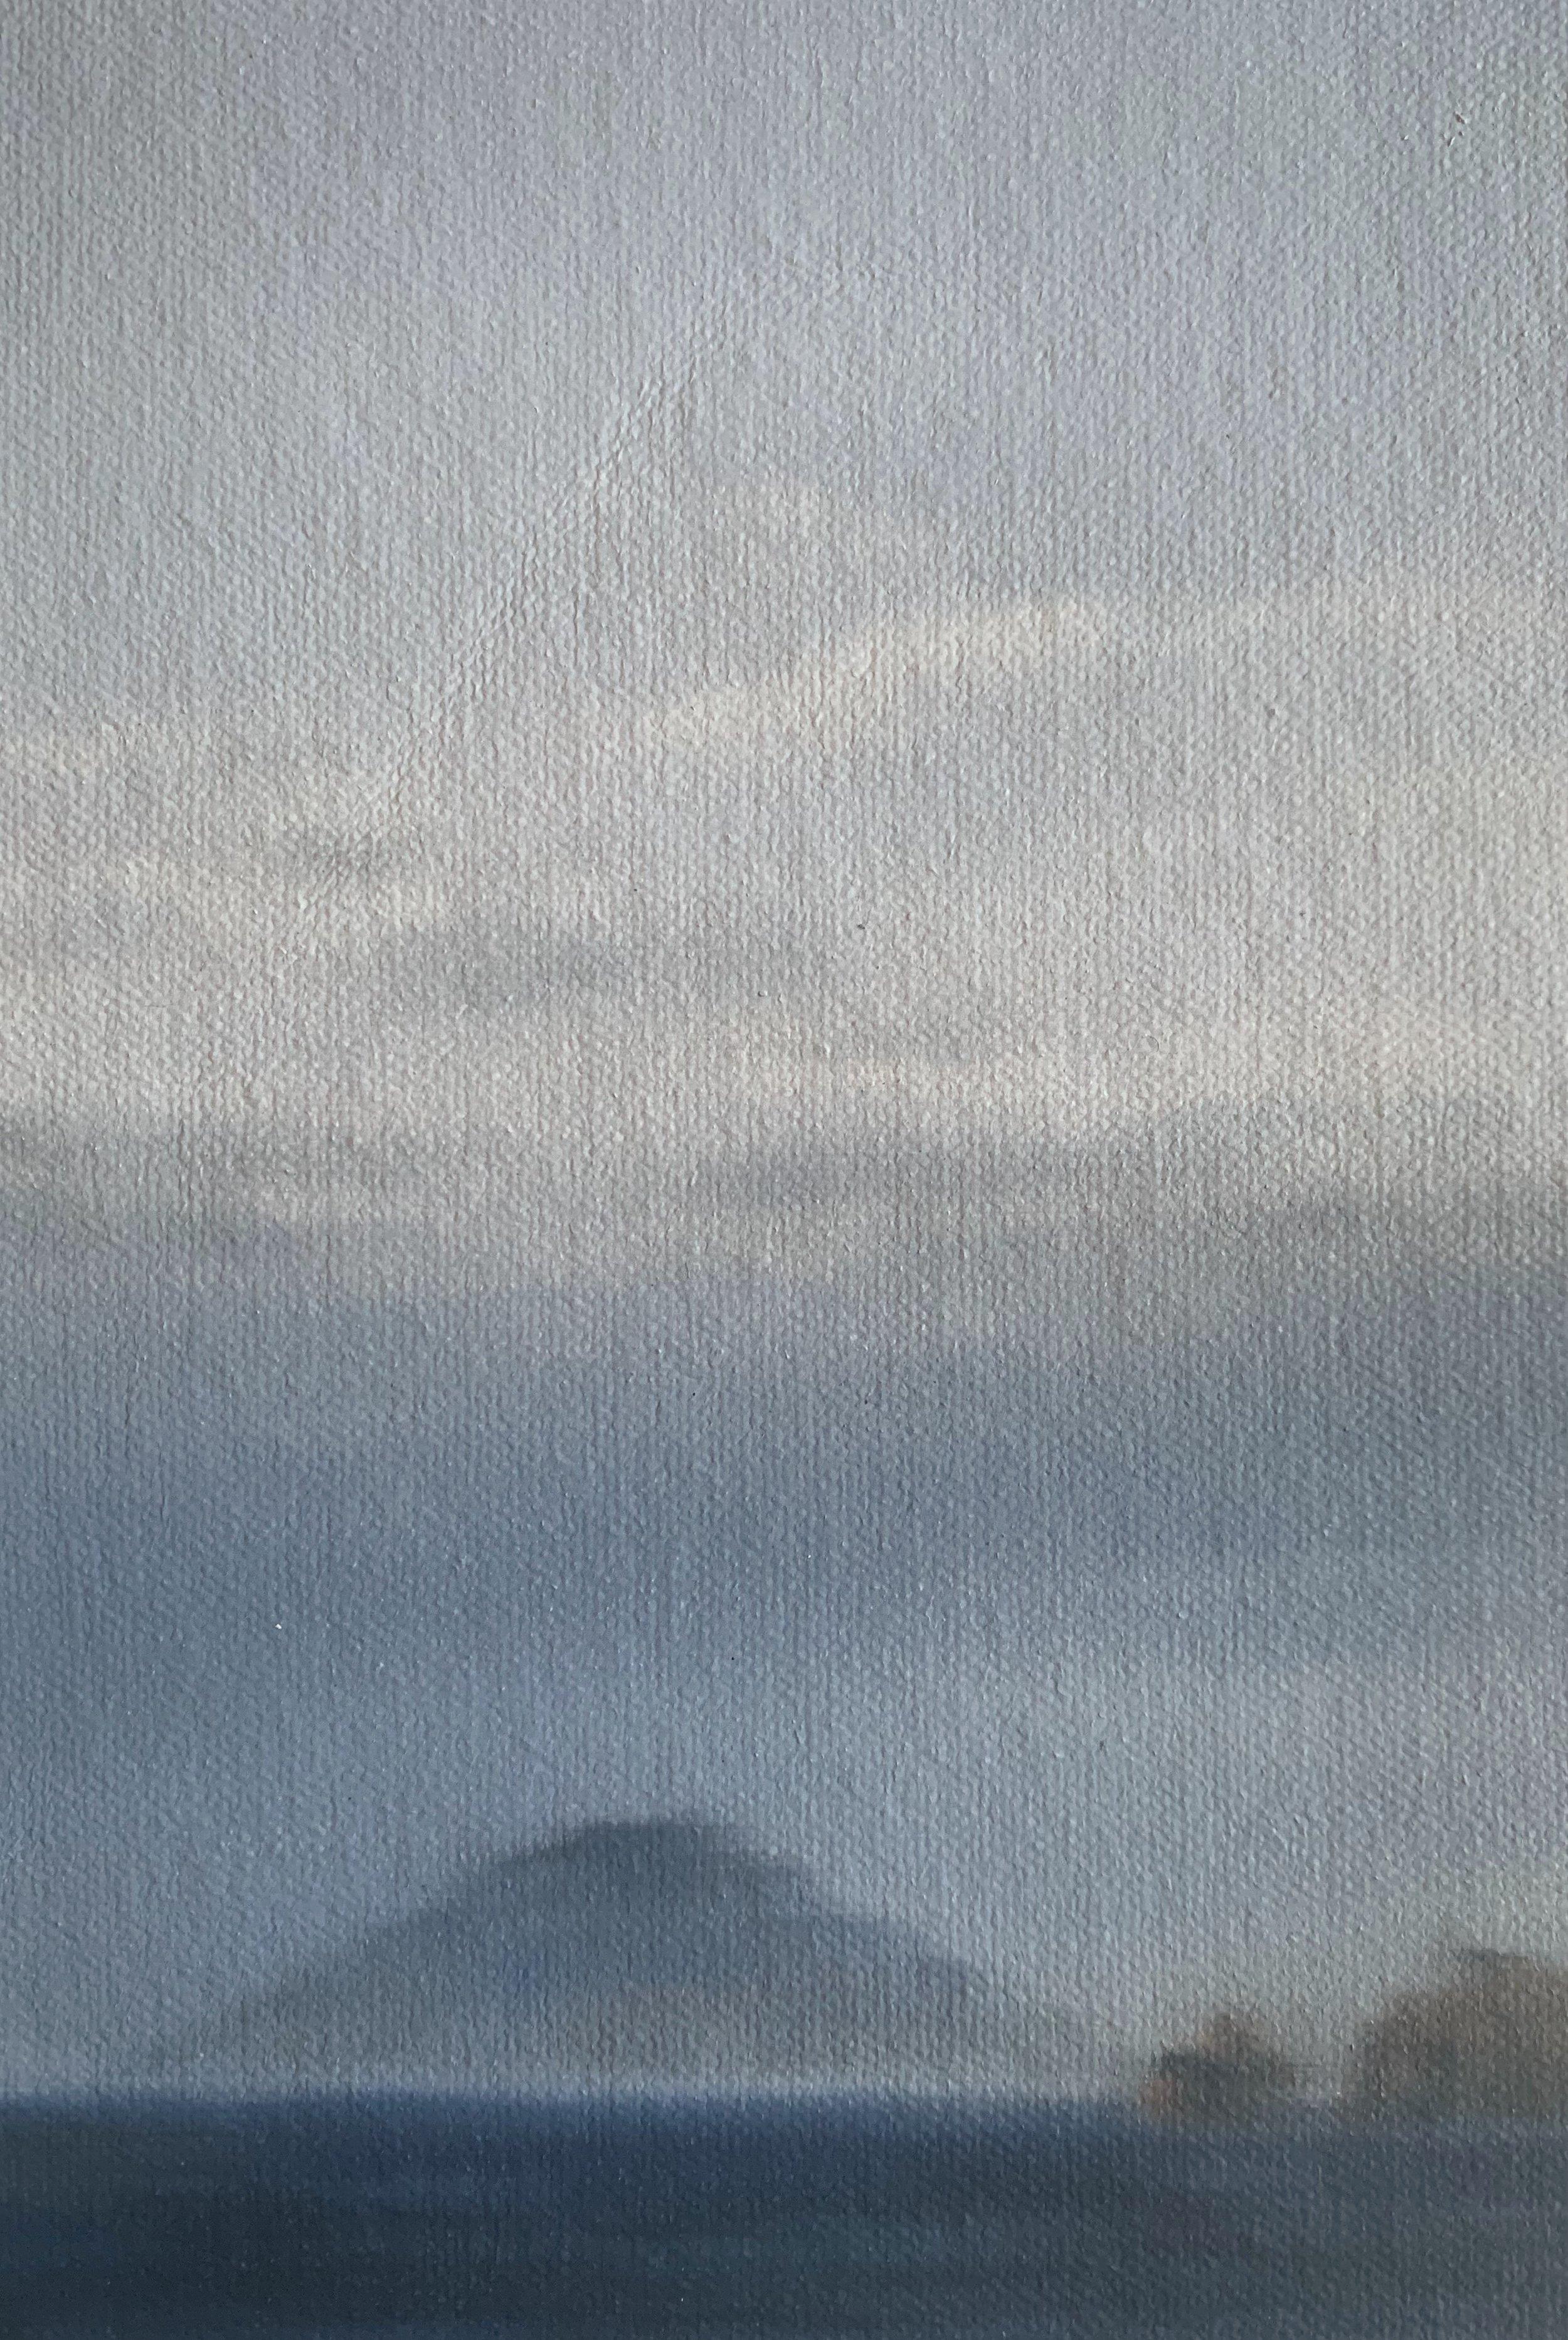 AMELIA CARROLL  image.85 , 2019 oil on canvas 18 x 12.5 cm